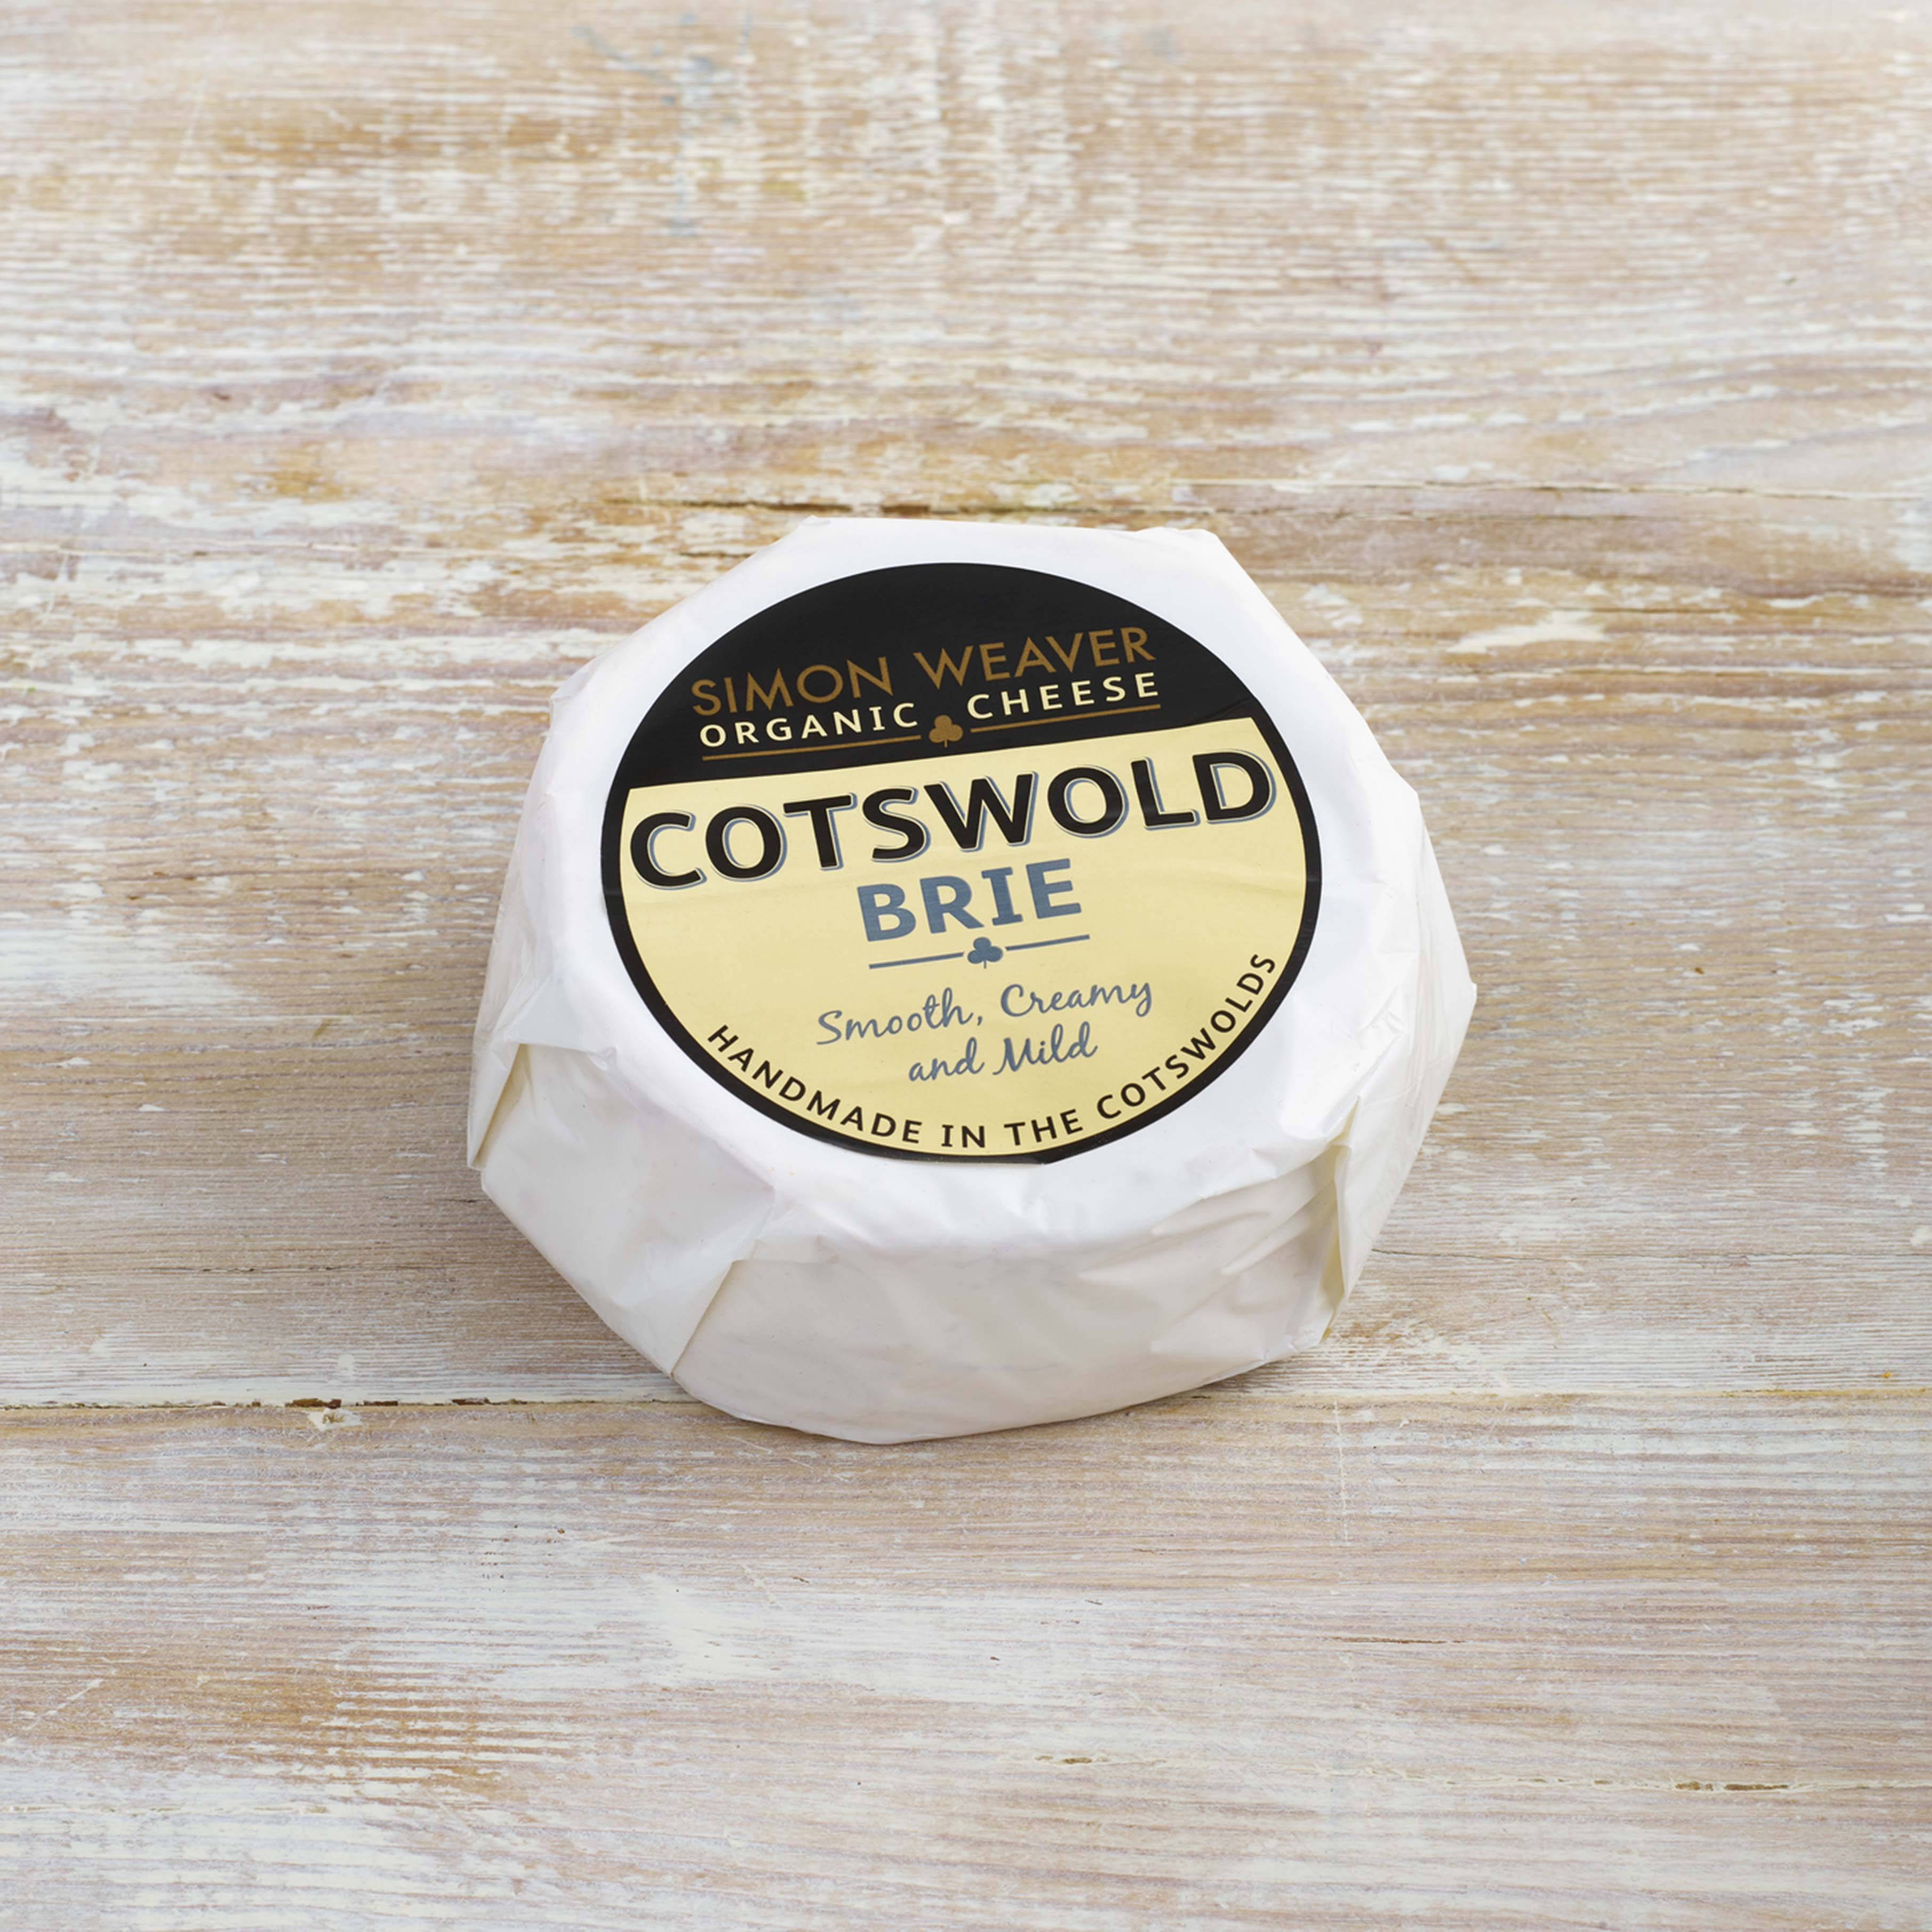 Simon Weaver Organic Cotswold Brie, 240g